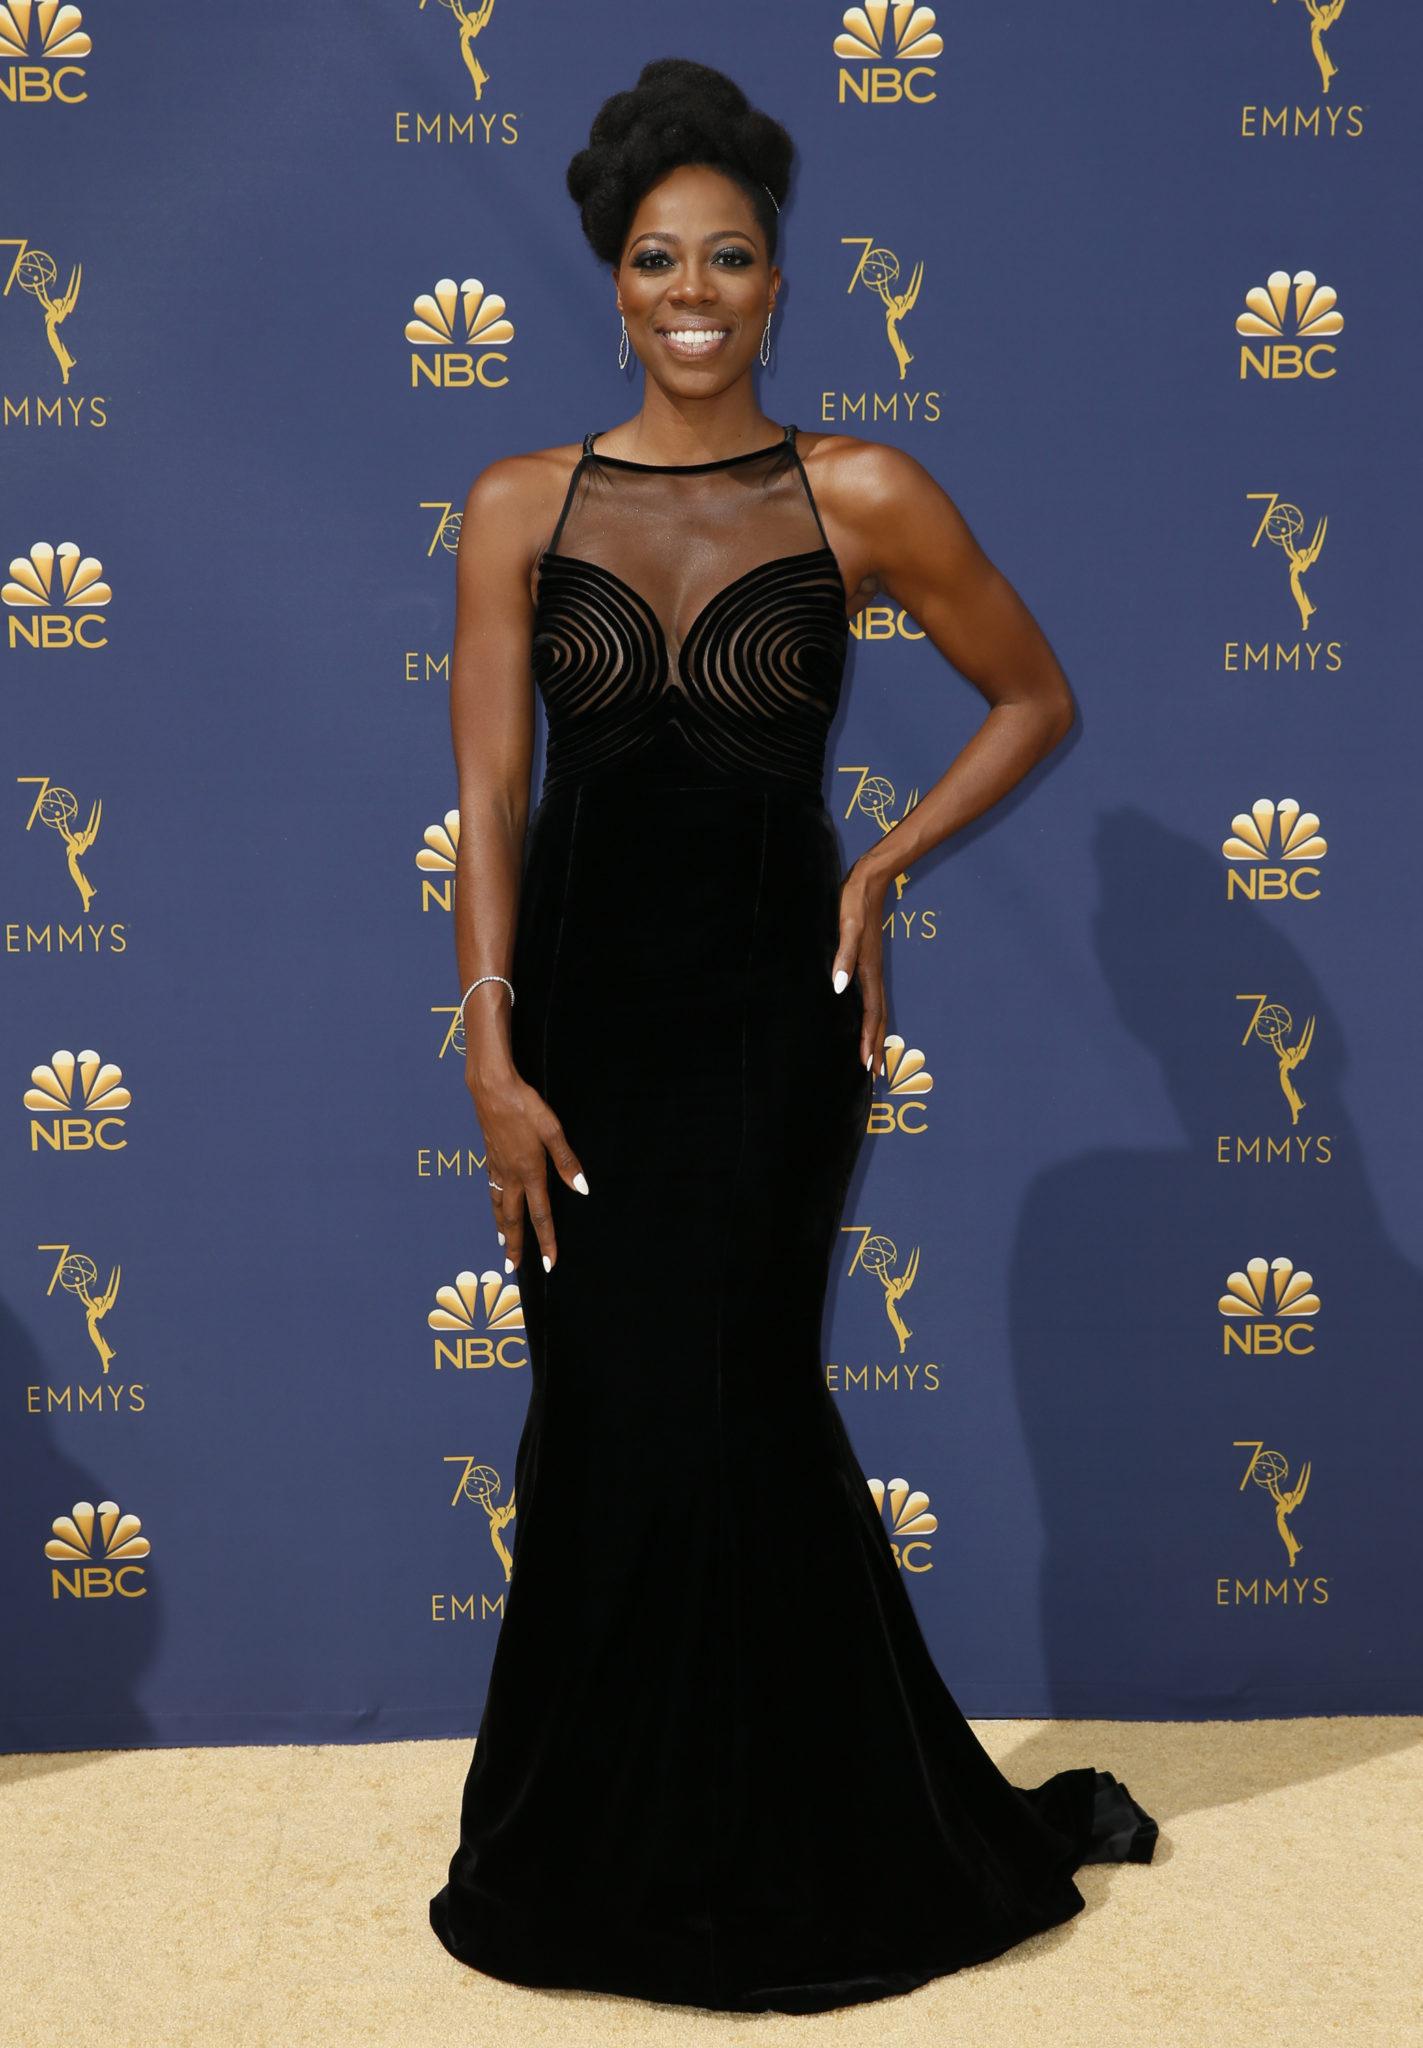 Yvonne Orji Emmys 4Chion Lifestyle